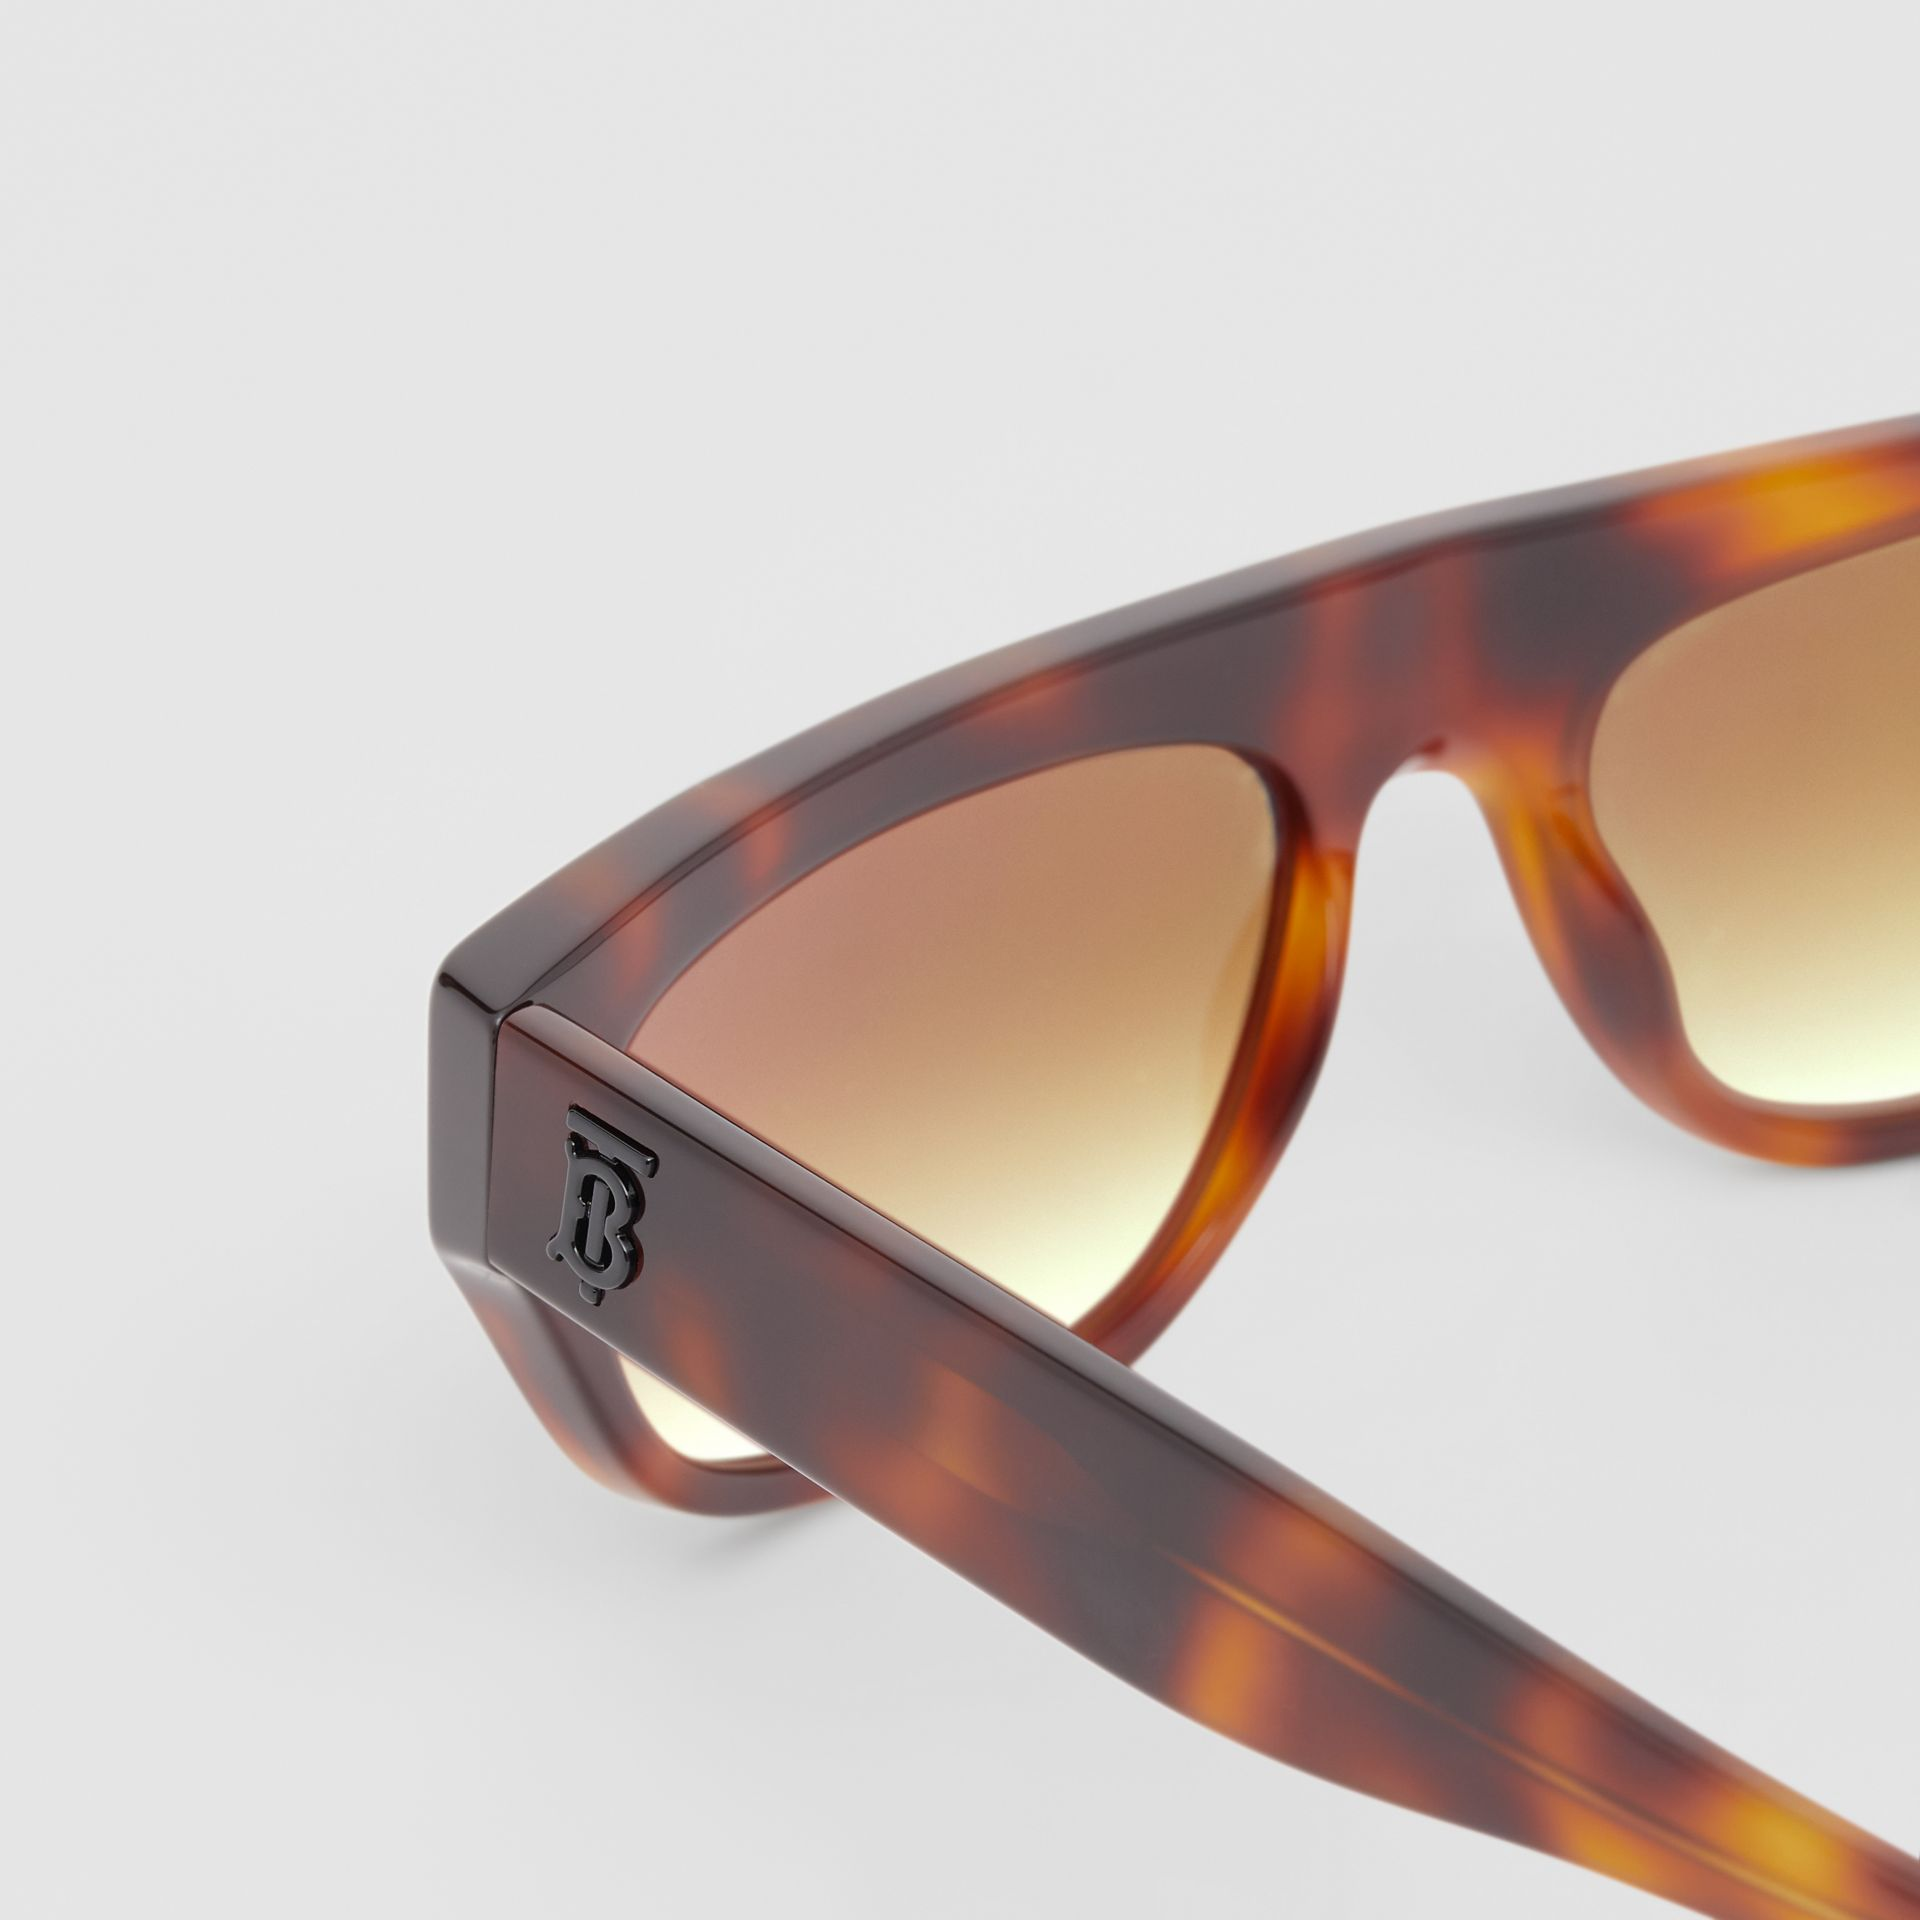 Monogram Motif Rectangular Frame Sunglasses in Amber Tortoiseshell | Burberry - gallery image 1